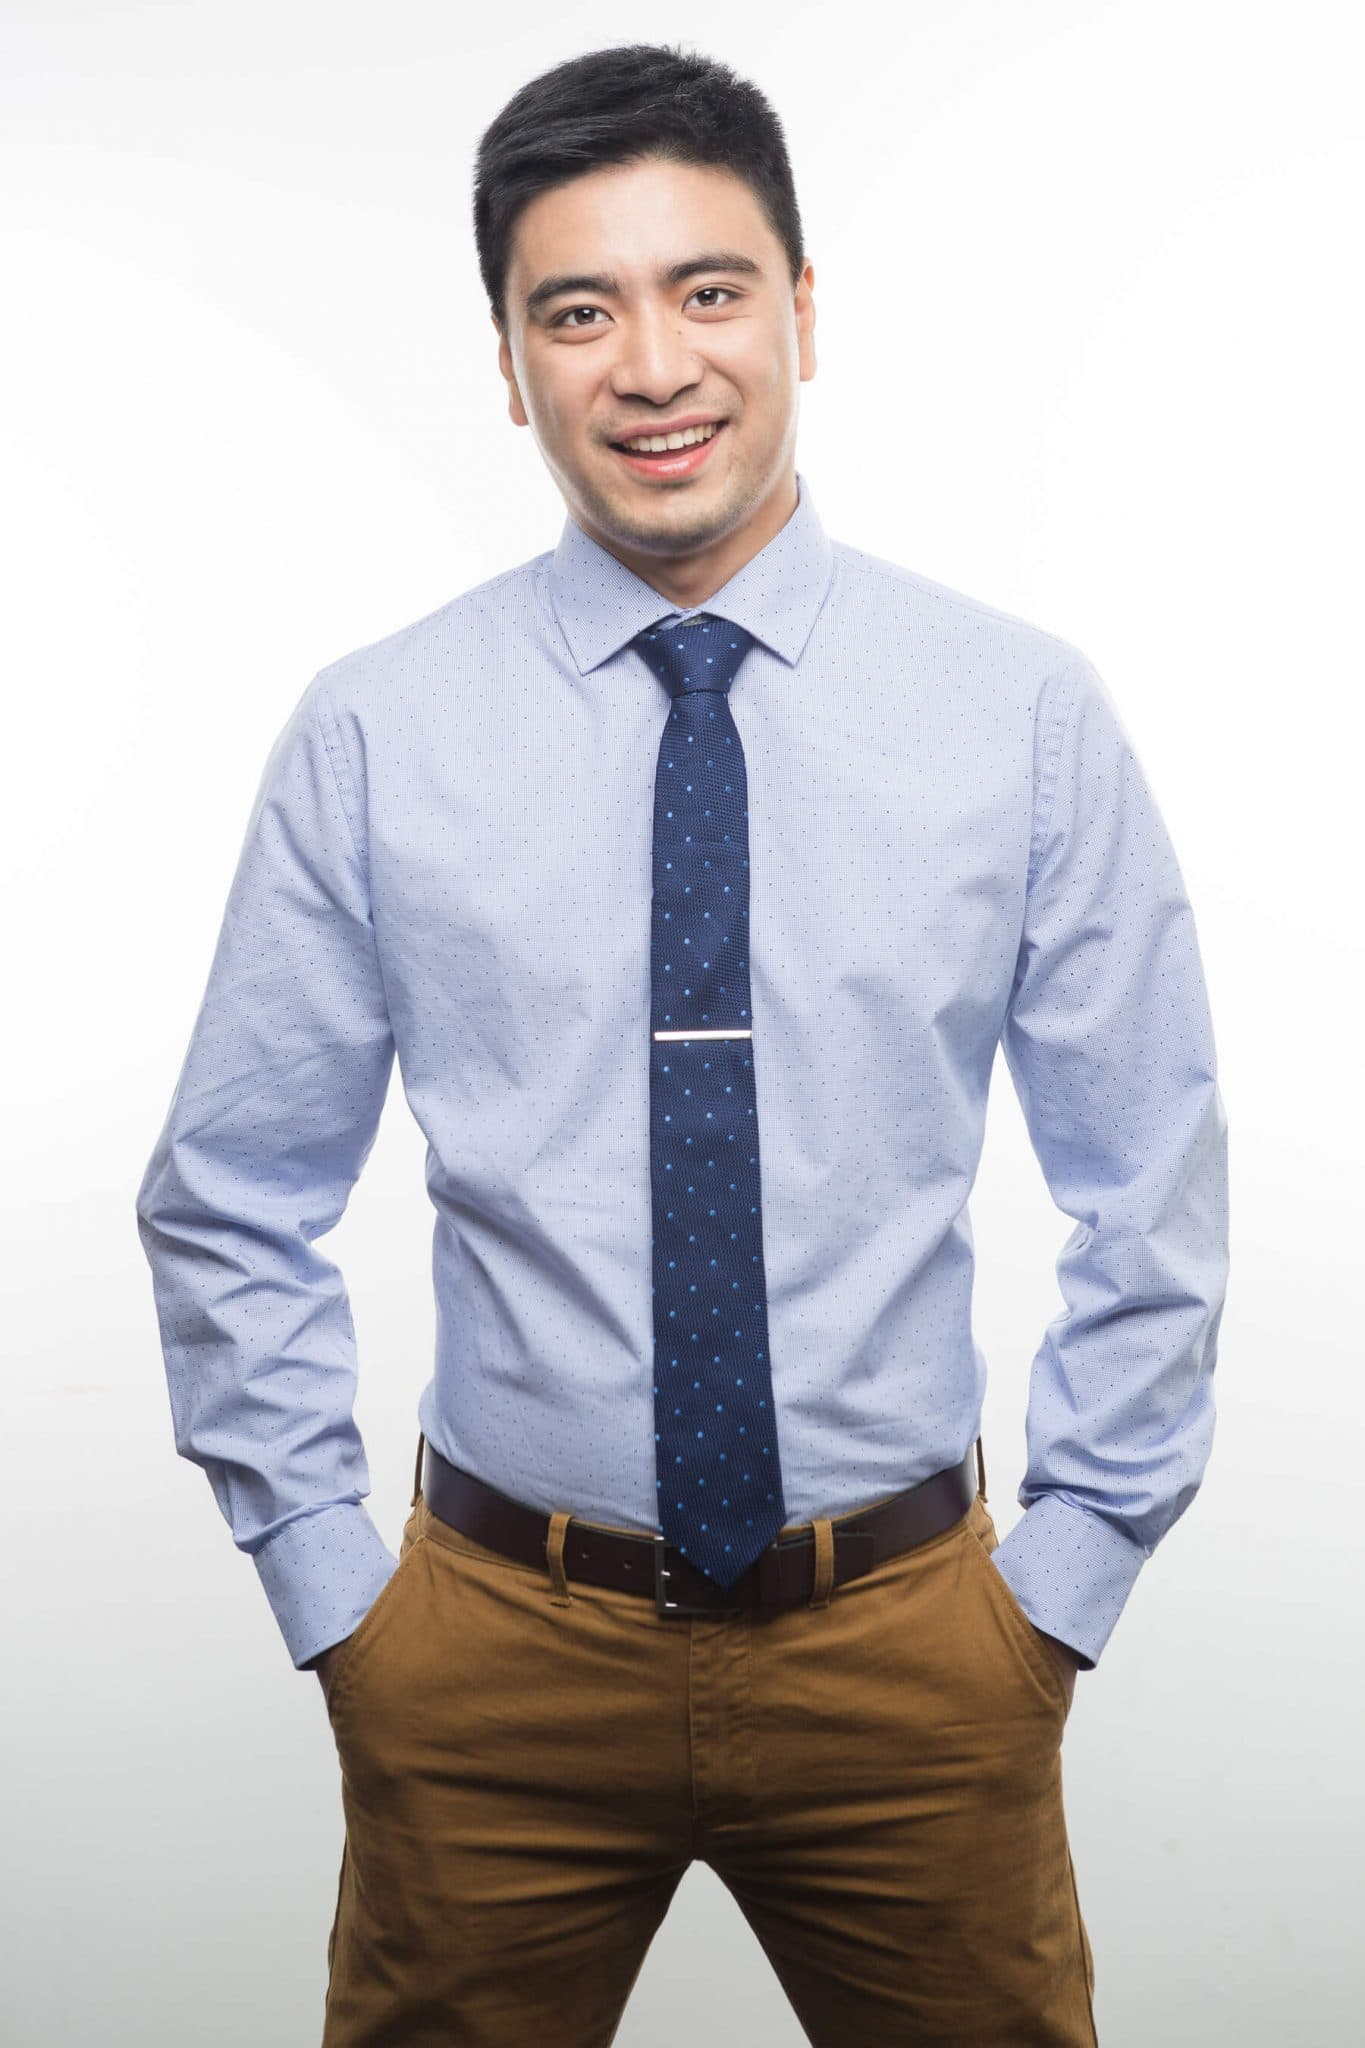 Ryan Liu Rushable